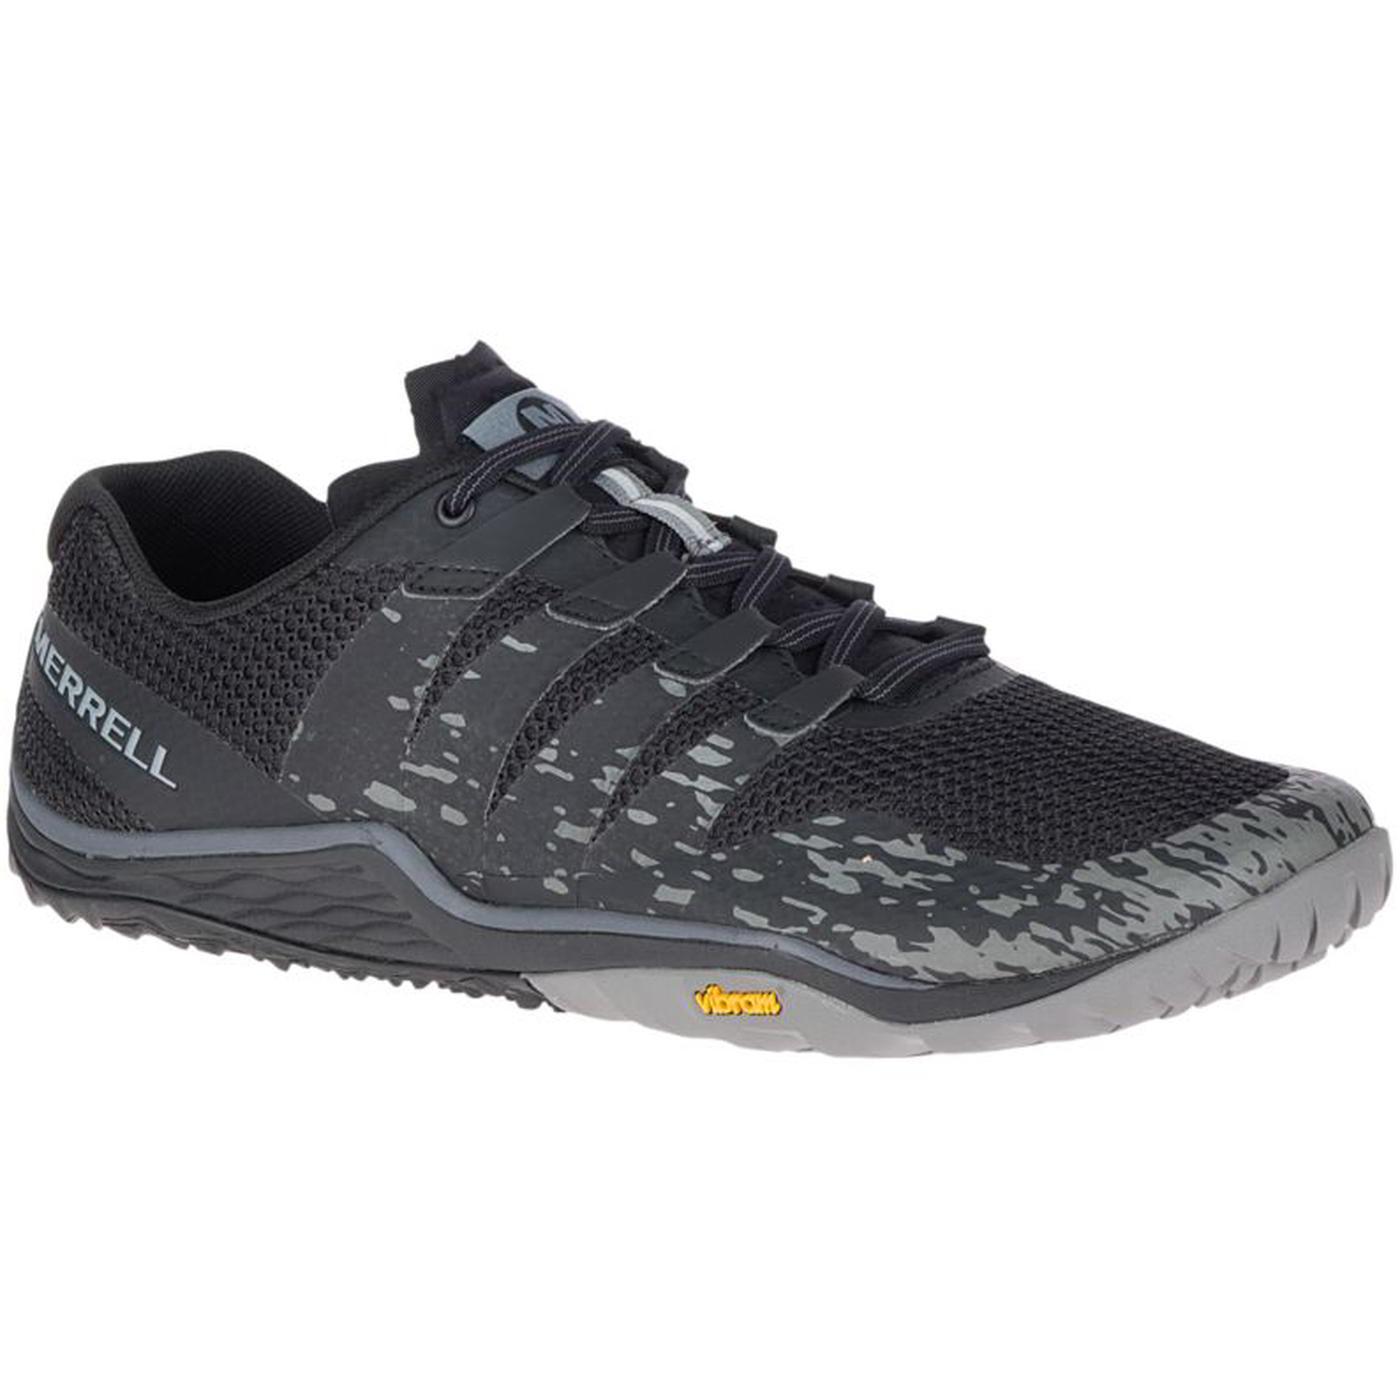 Merrell Mens Trail Glove 5 Vegan Barefoot Walking Running Shoes - Black